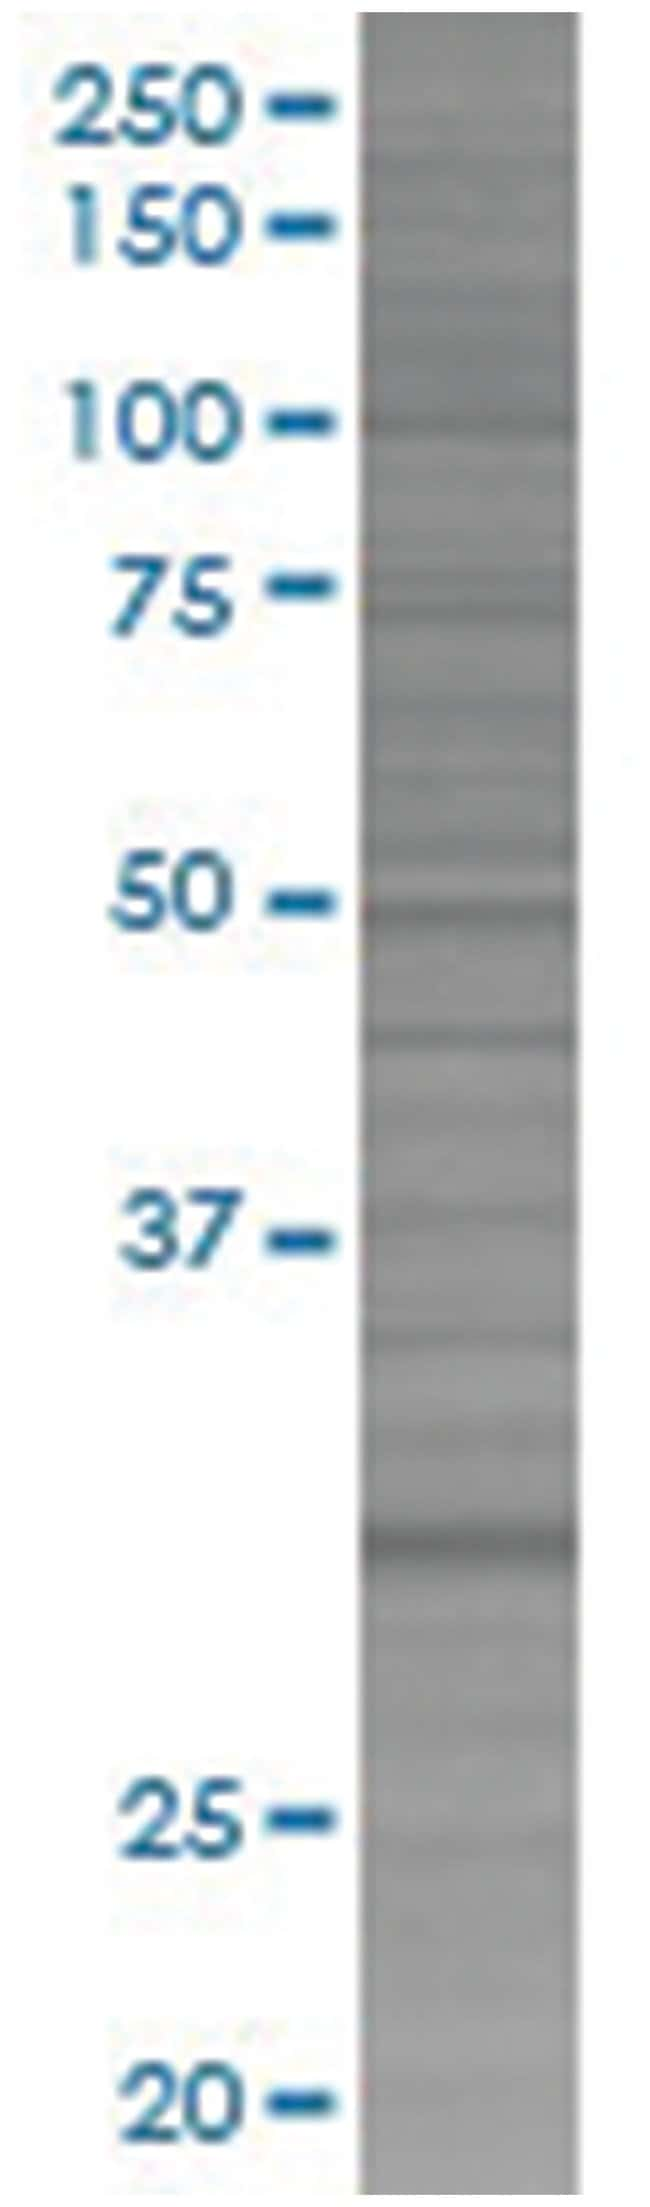 KHK 293T Cell Overexpression Lysate (Denatured), Abnova 100µL:Life